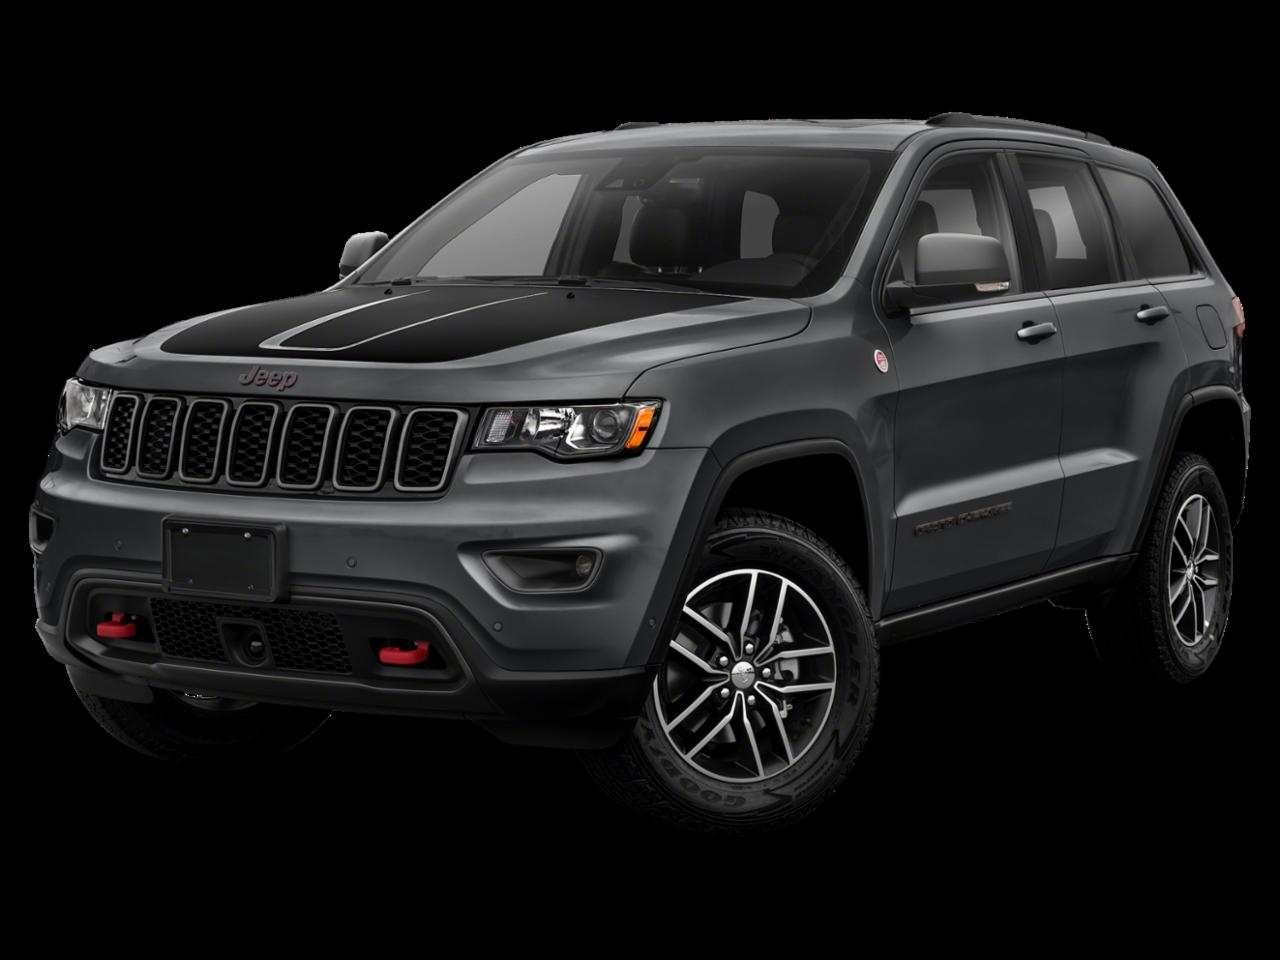 Jeep 2020 Grand Cherokee Trailhawk